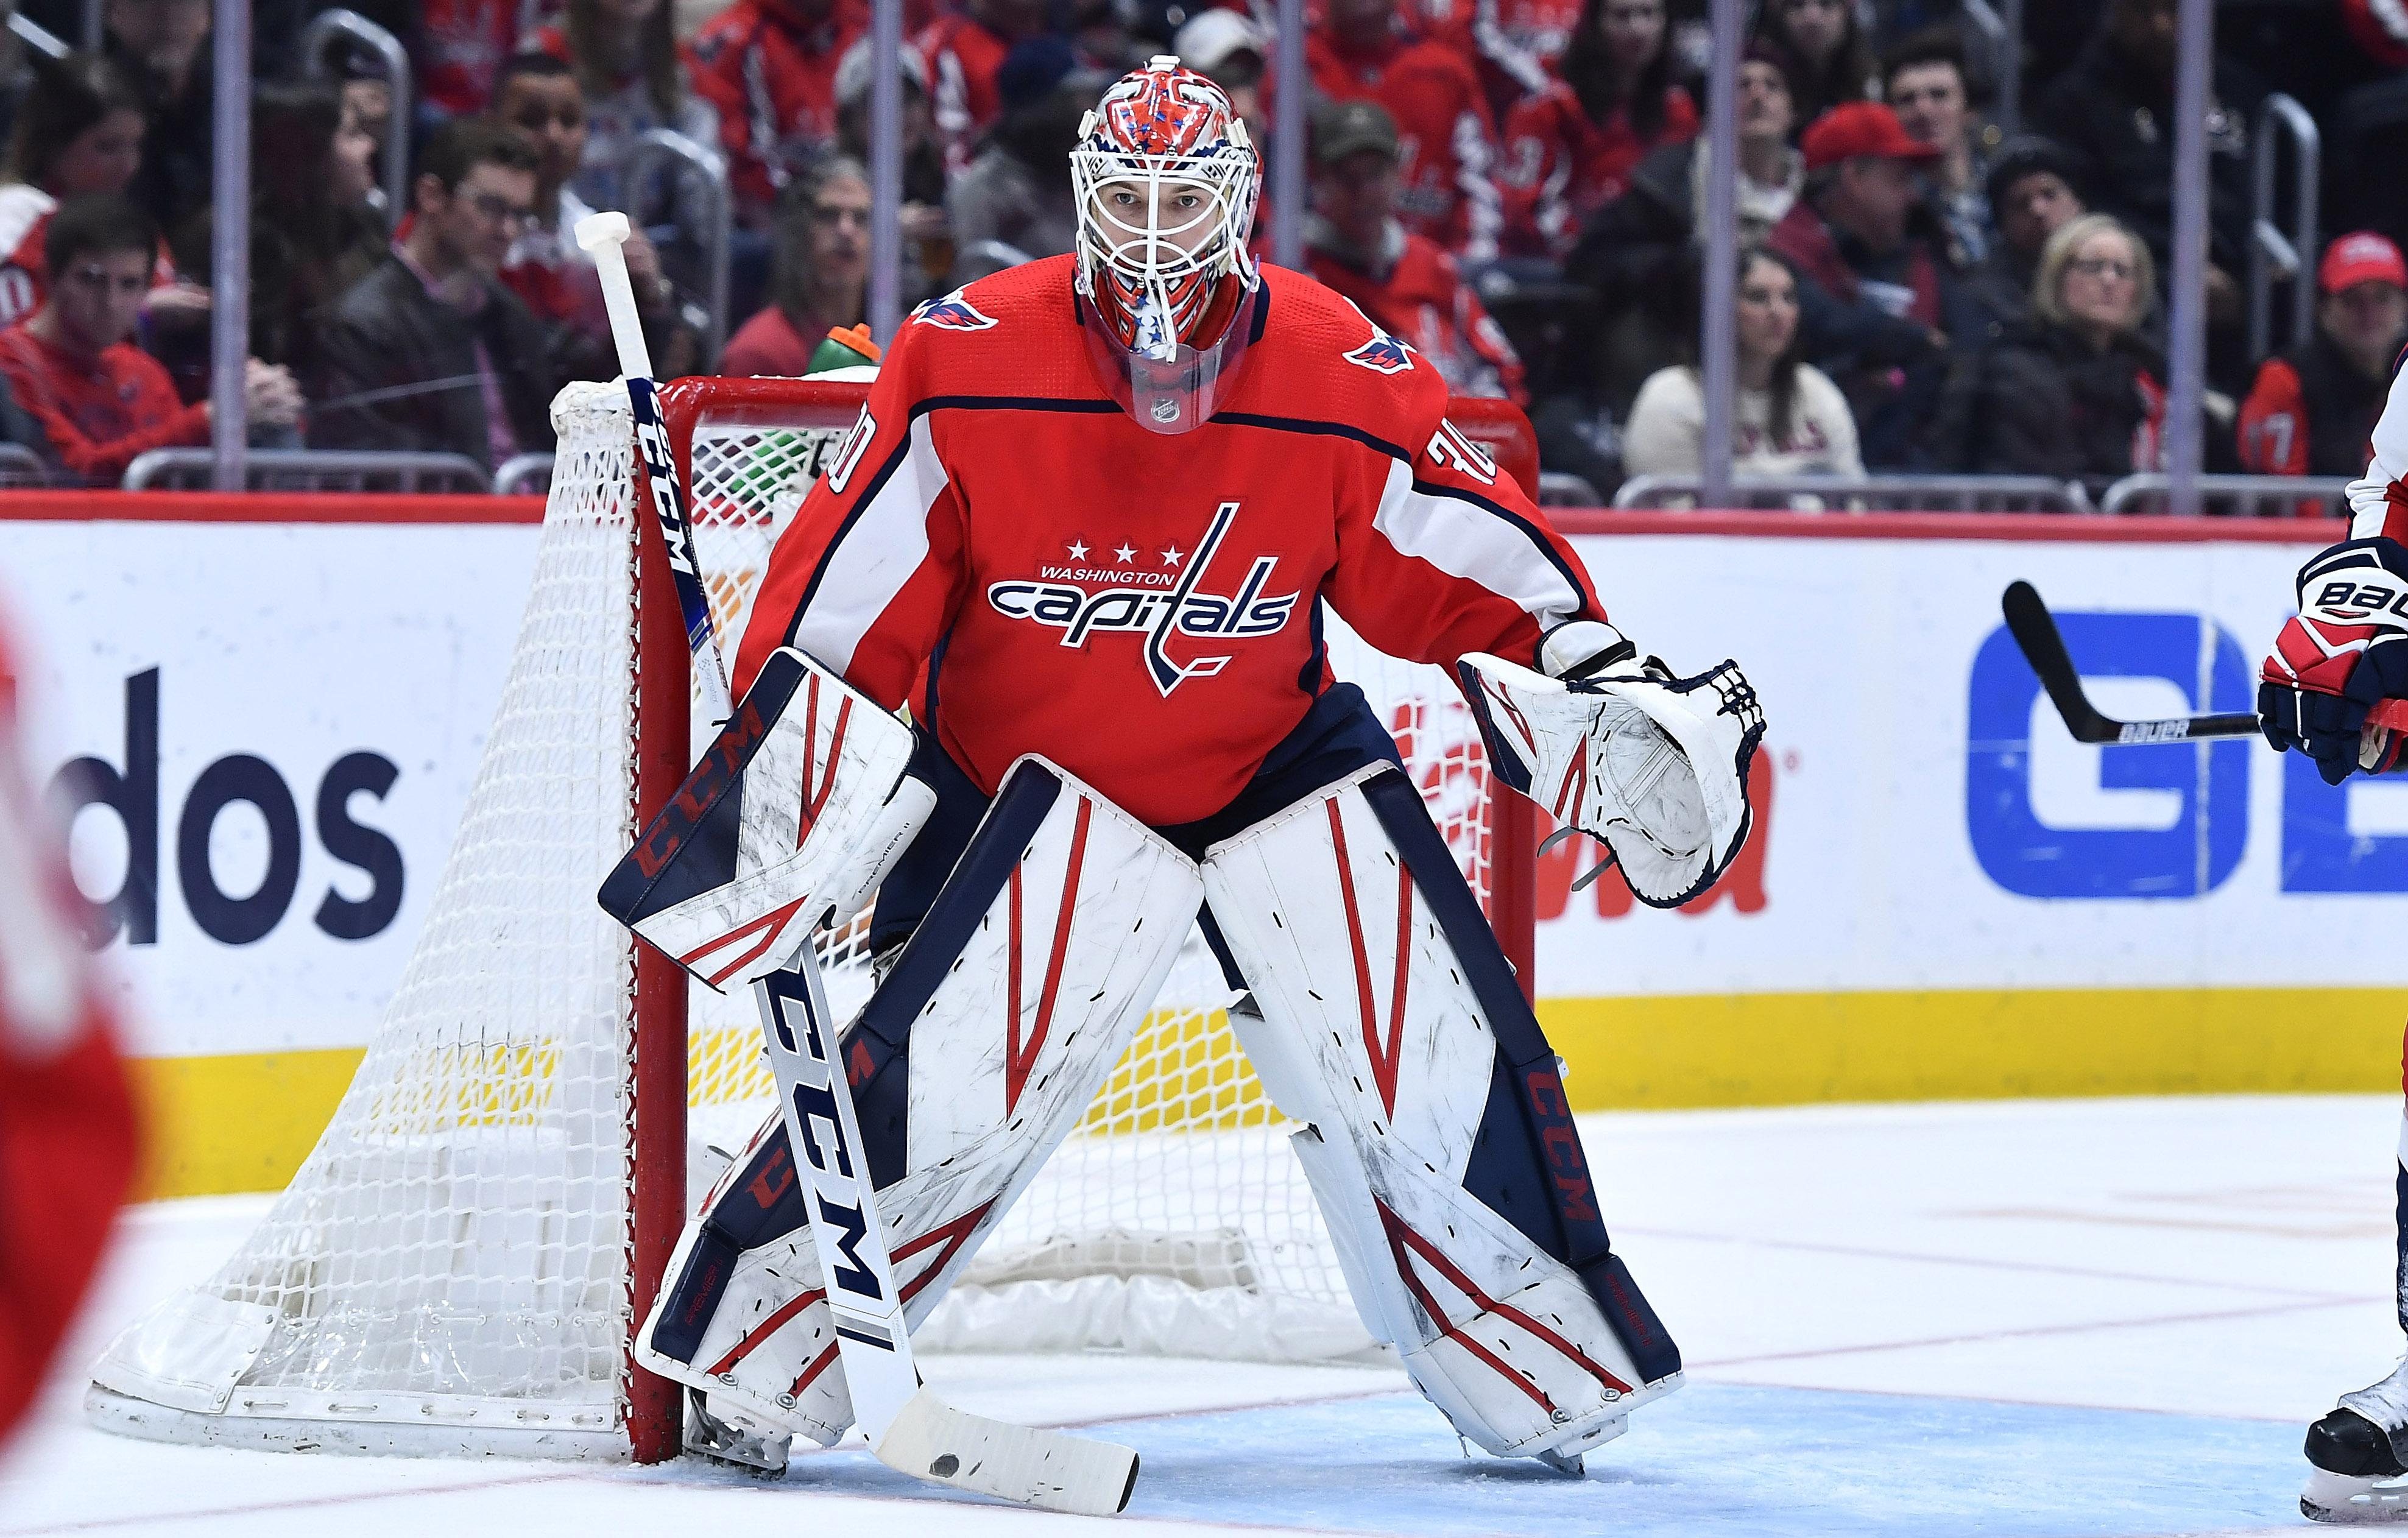 Ilya Samsonov records third career NHL shutout